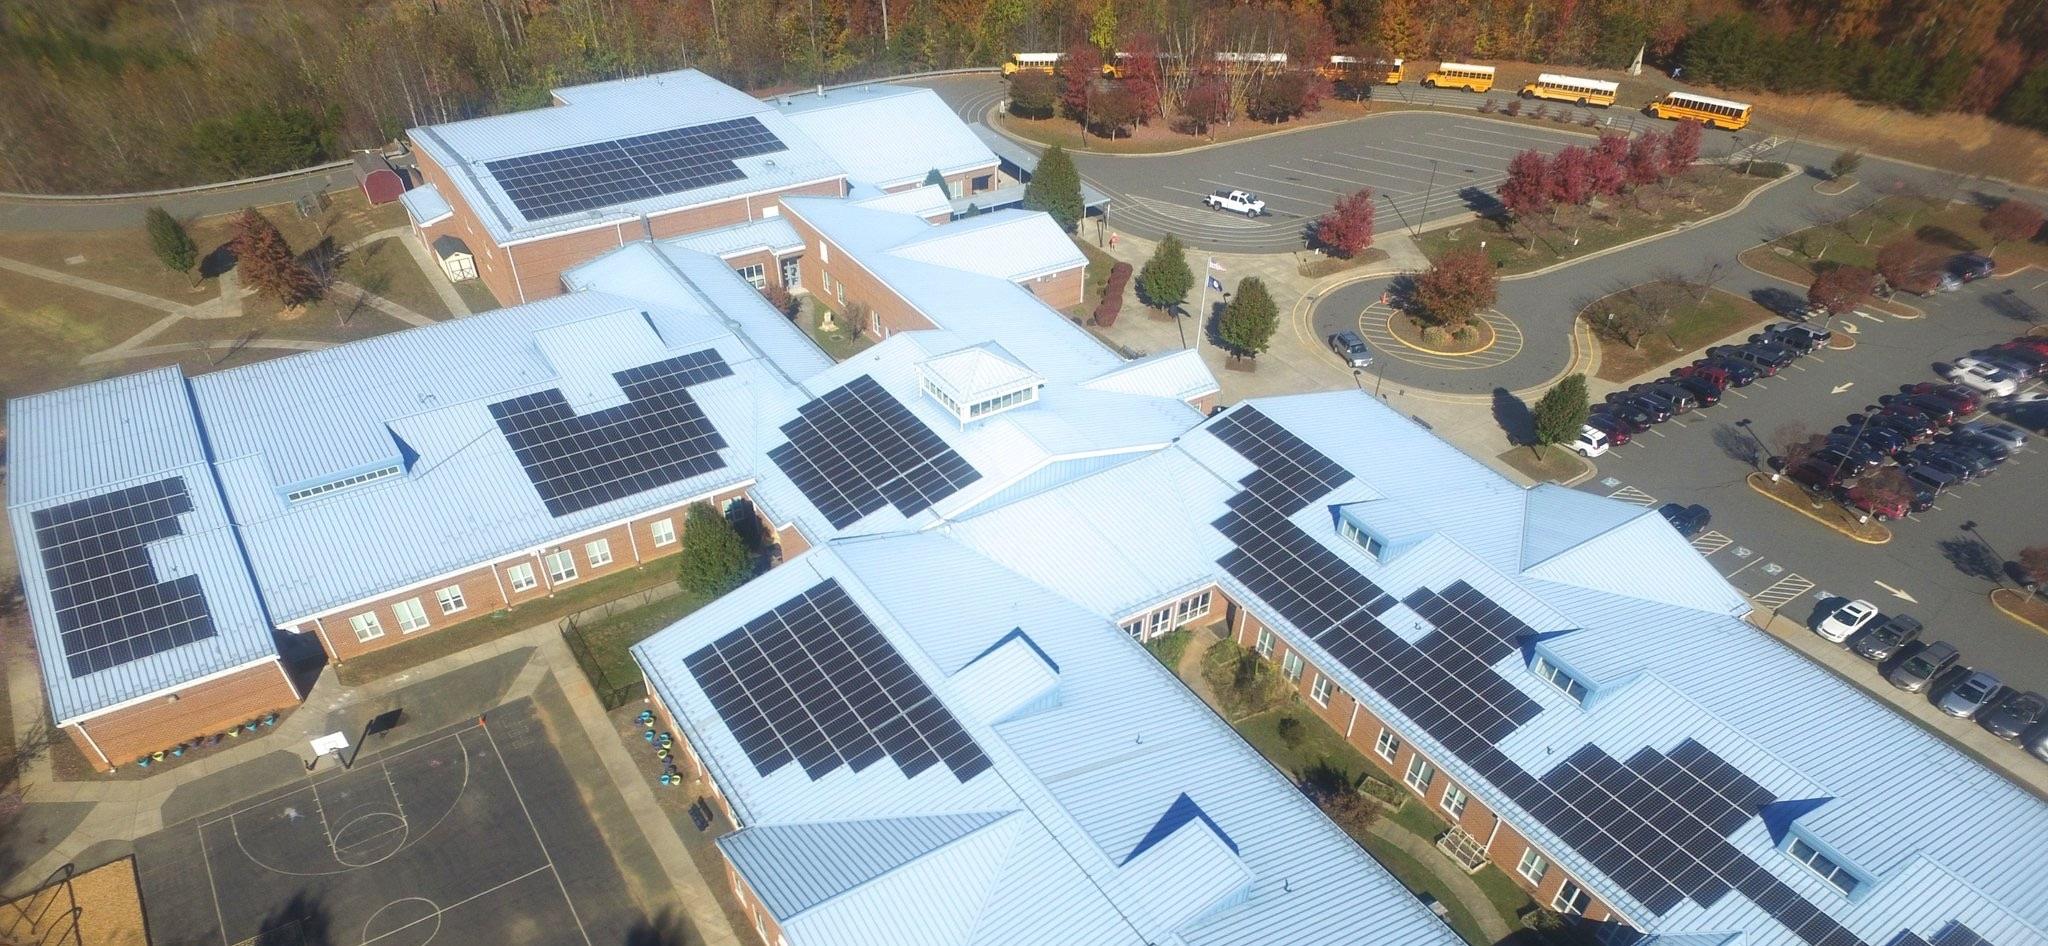 RVA Solar Fund launches $200,000 grant program to advance solar energy in Greater Richmond Region